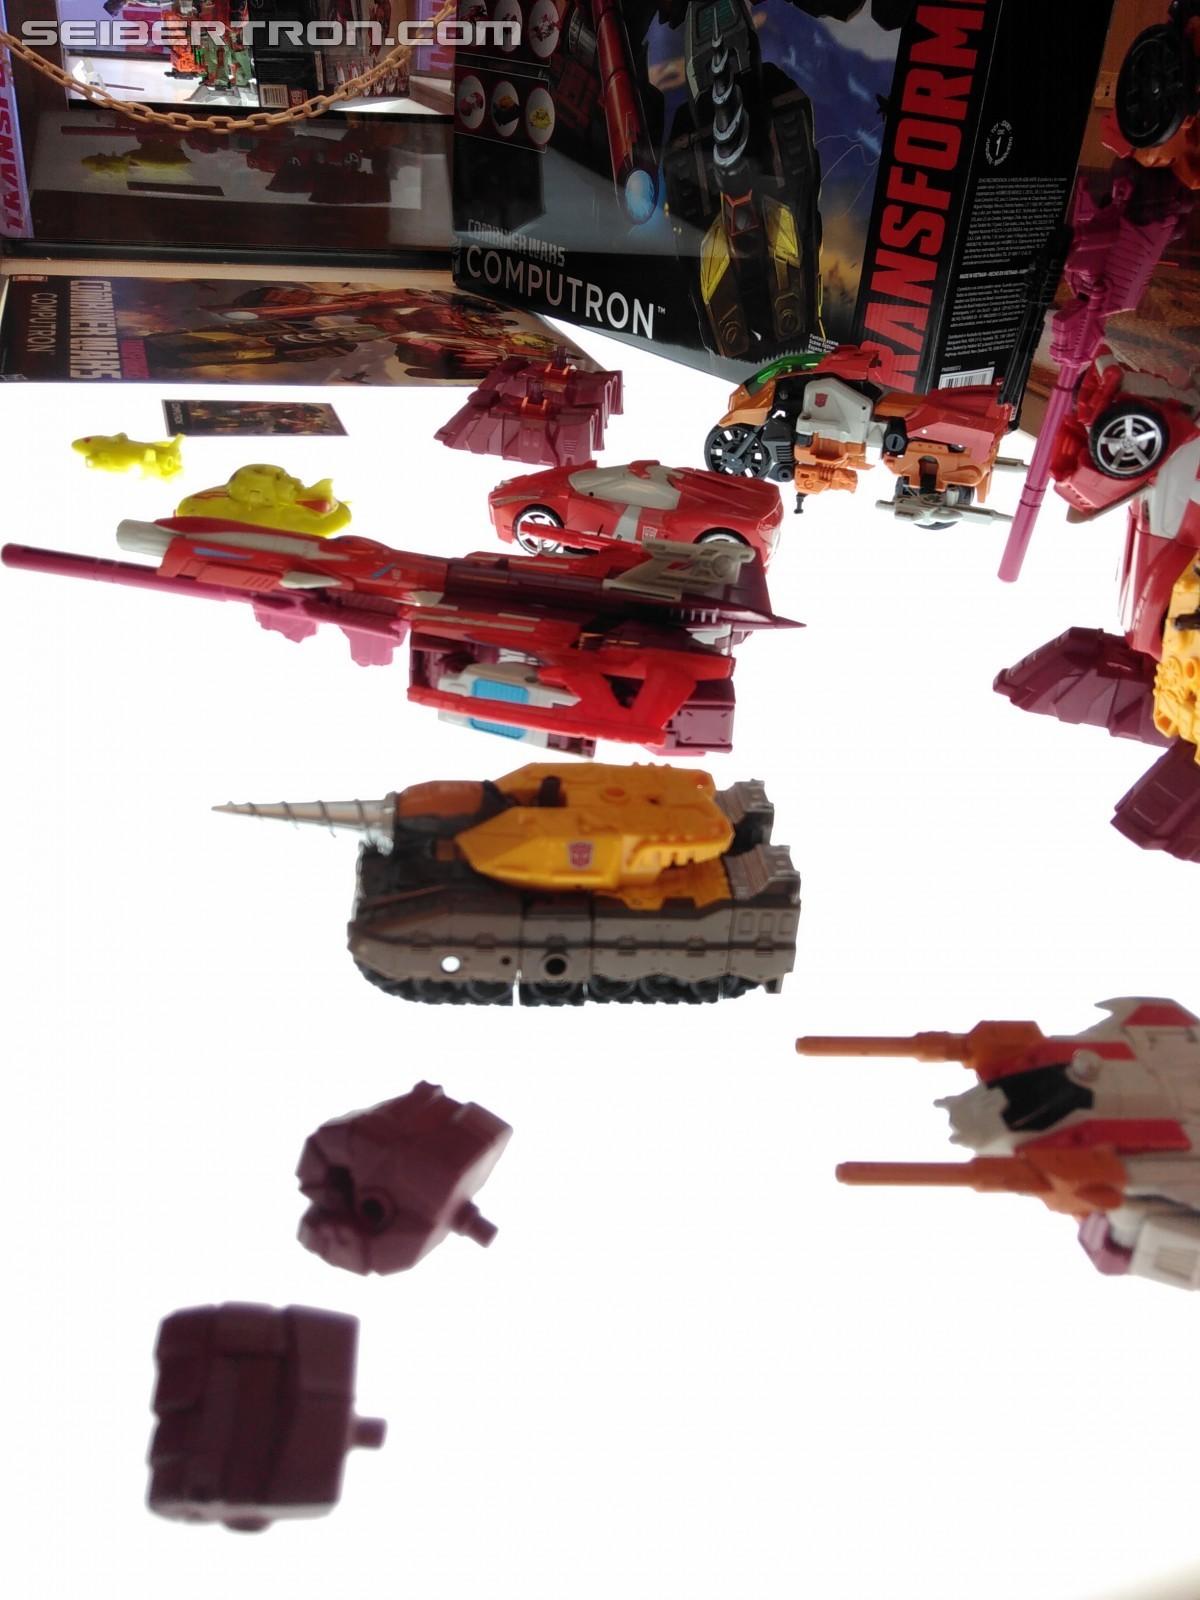 Transformers News: #Botcon2016 Galleries: Hasbro Floor Display - Wave 2 Titans Return, Computron +Technobots, Liokaiser